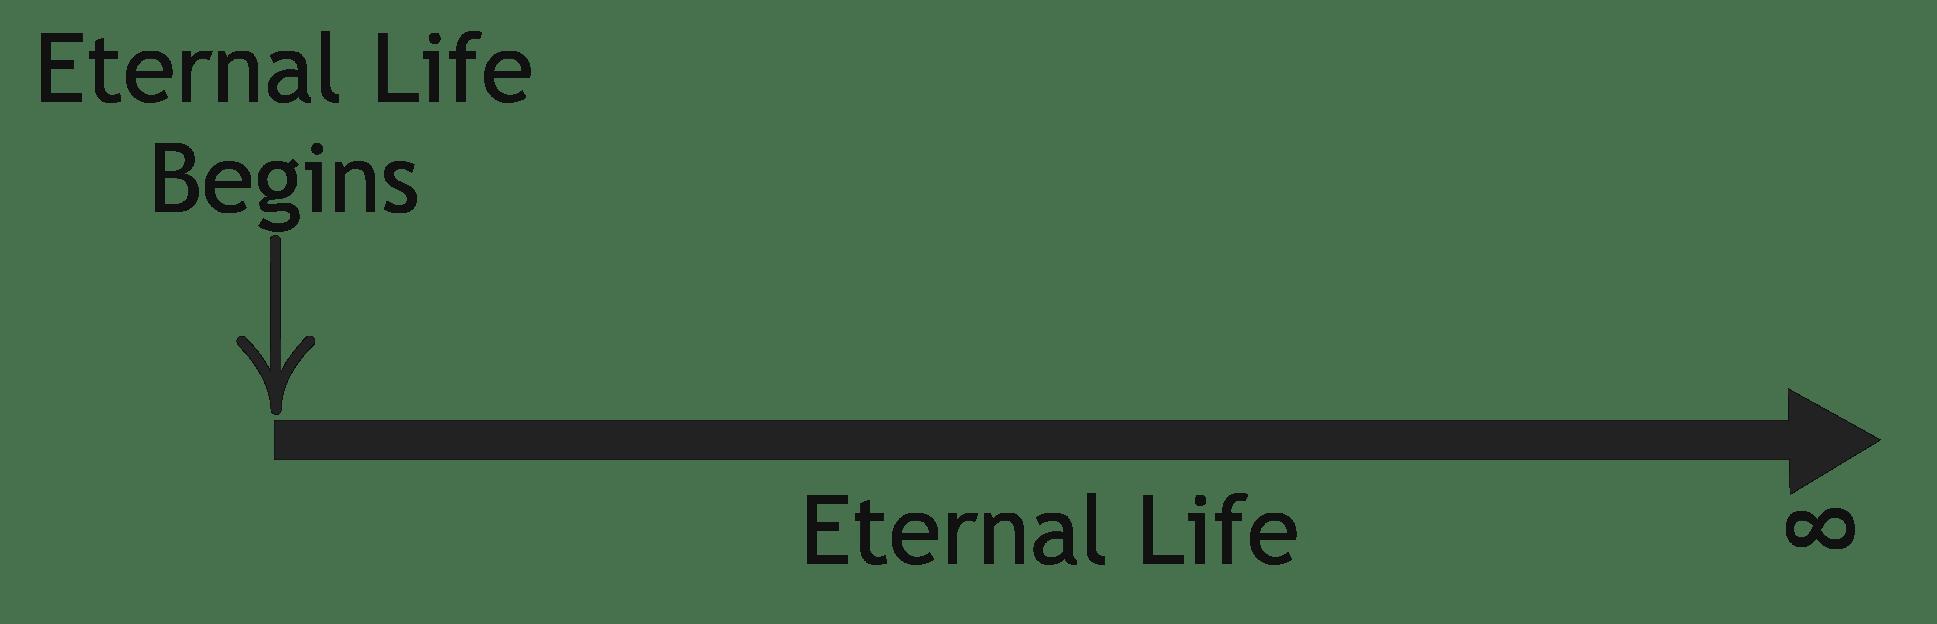 A Theological Chart